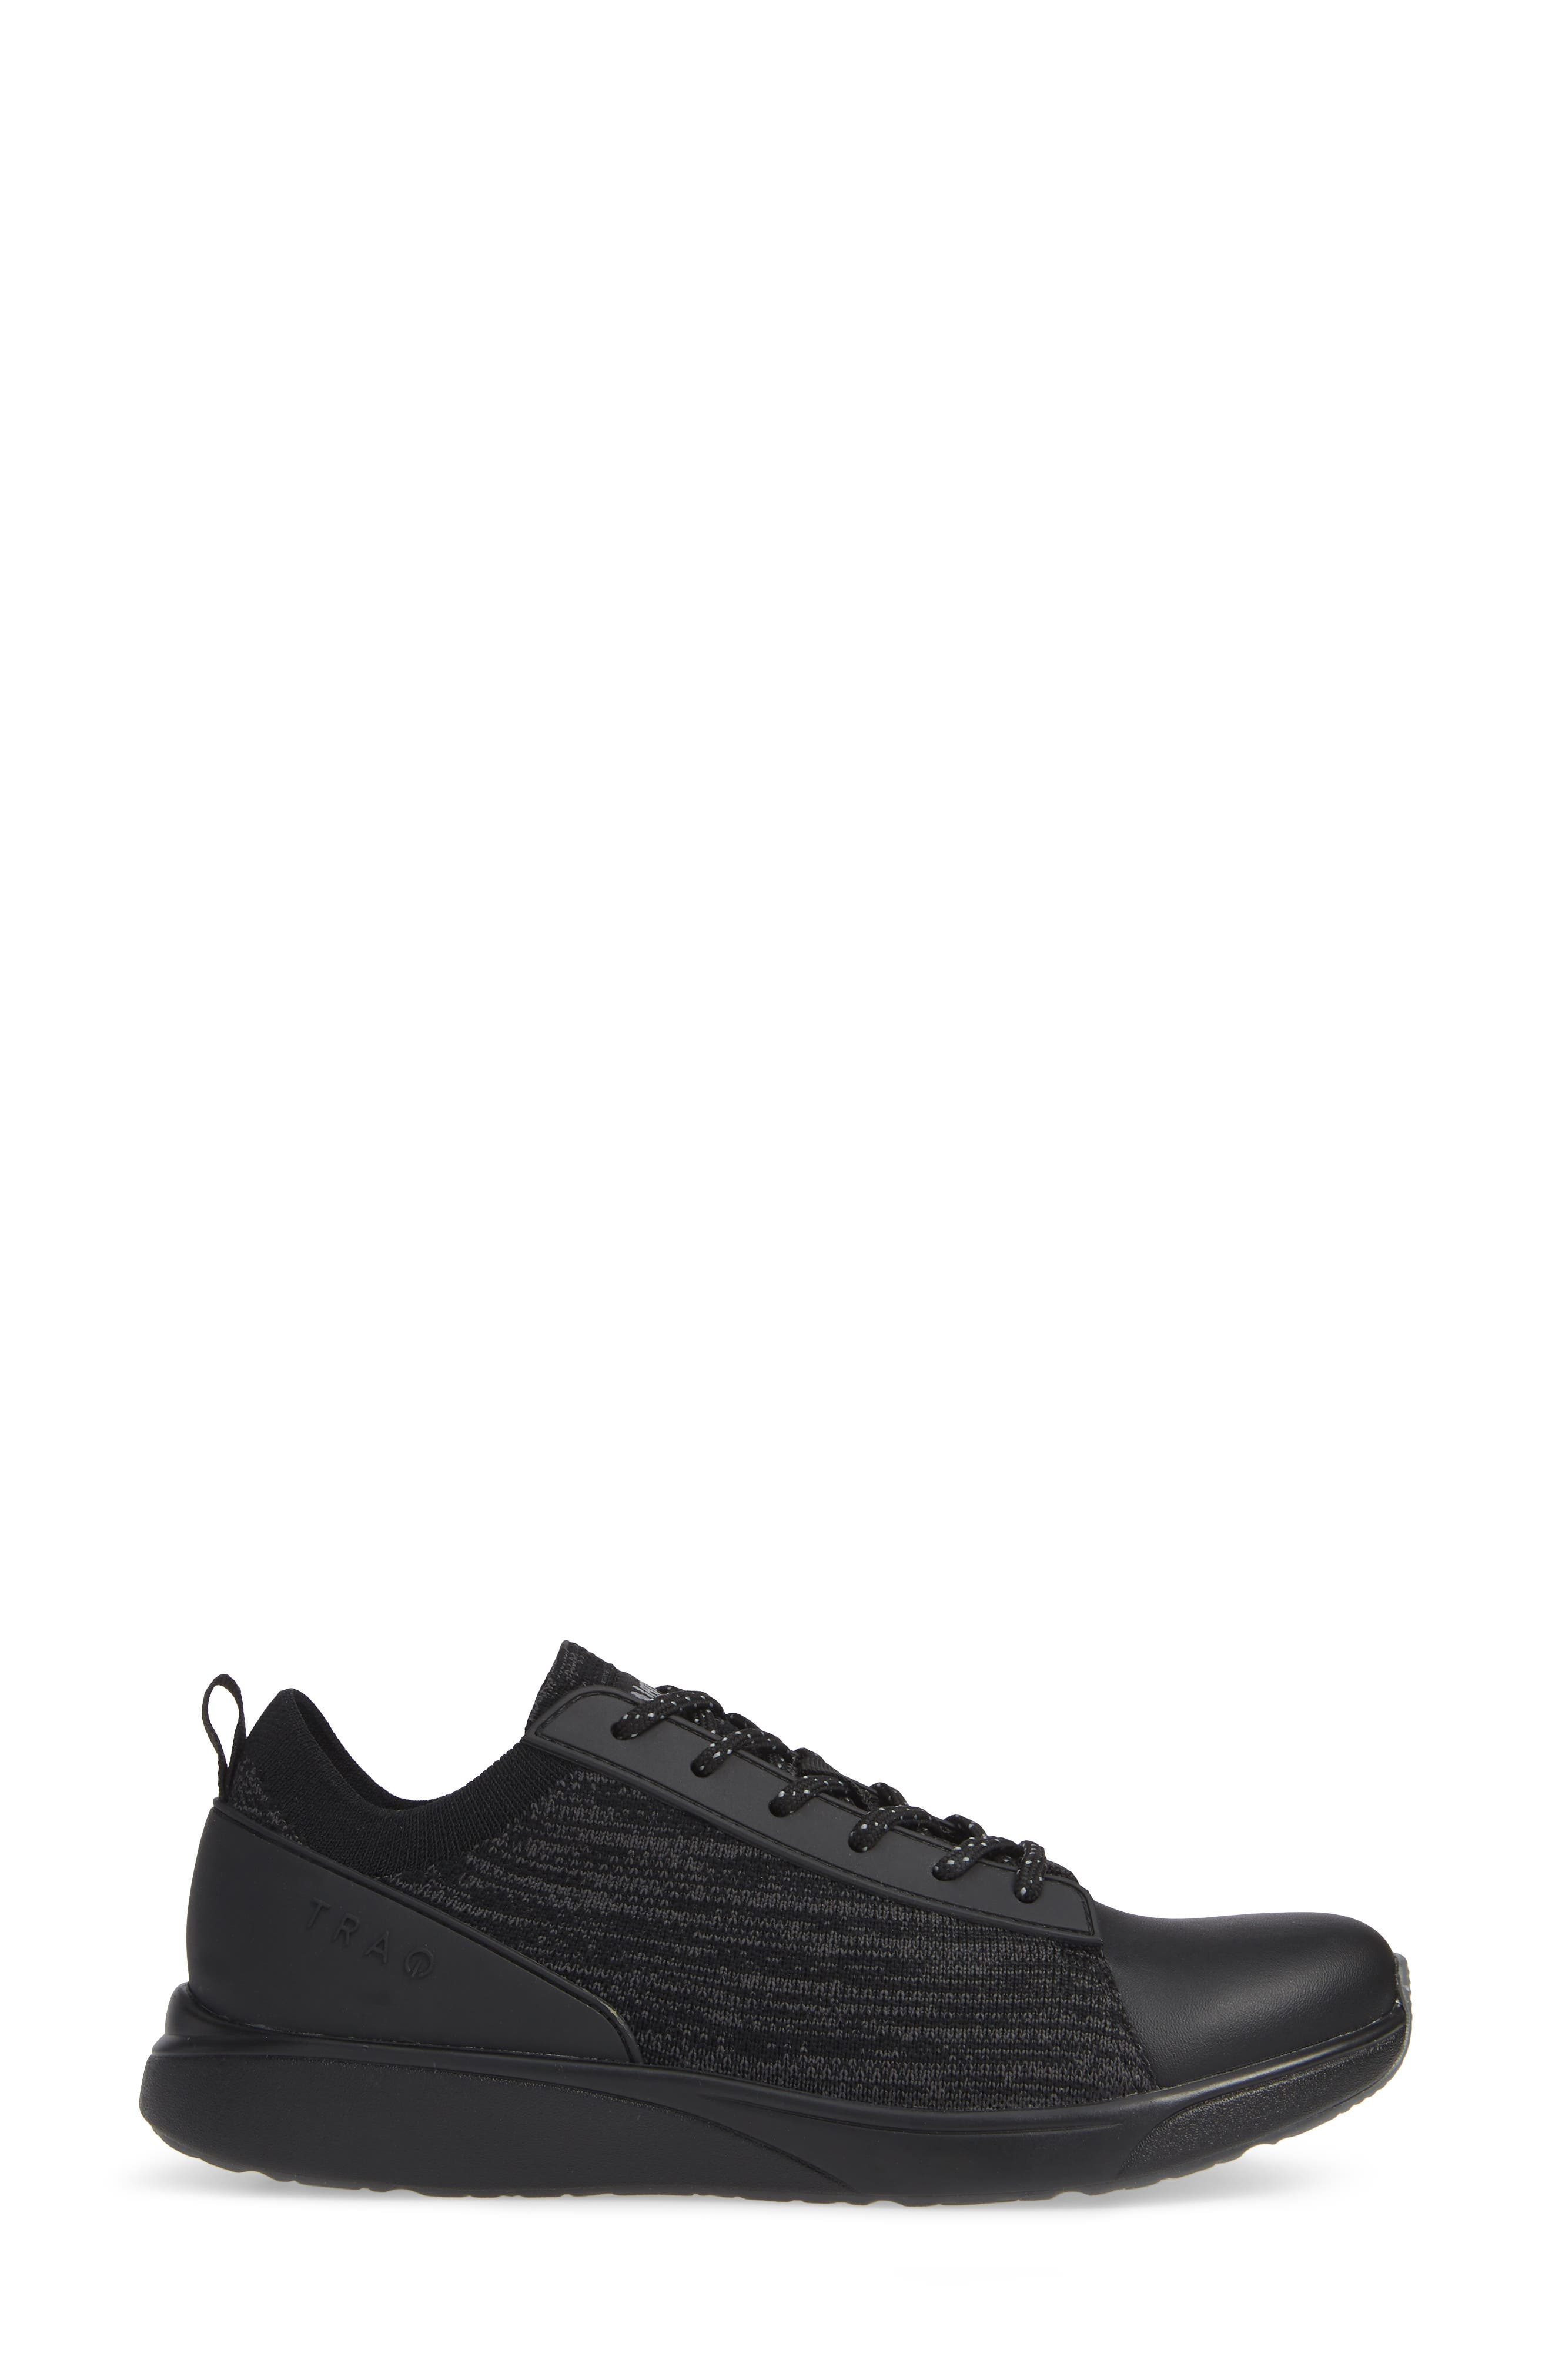 ALEGRIA, Qest Sneaker, Alternate thumbnail 3, color, BLACK LEATHER